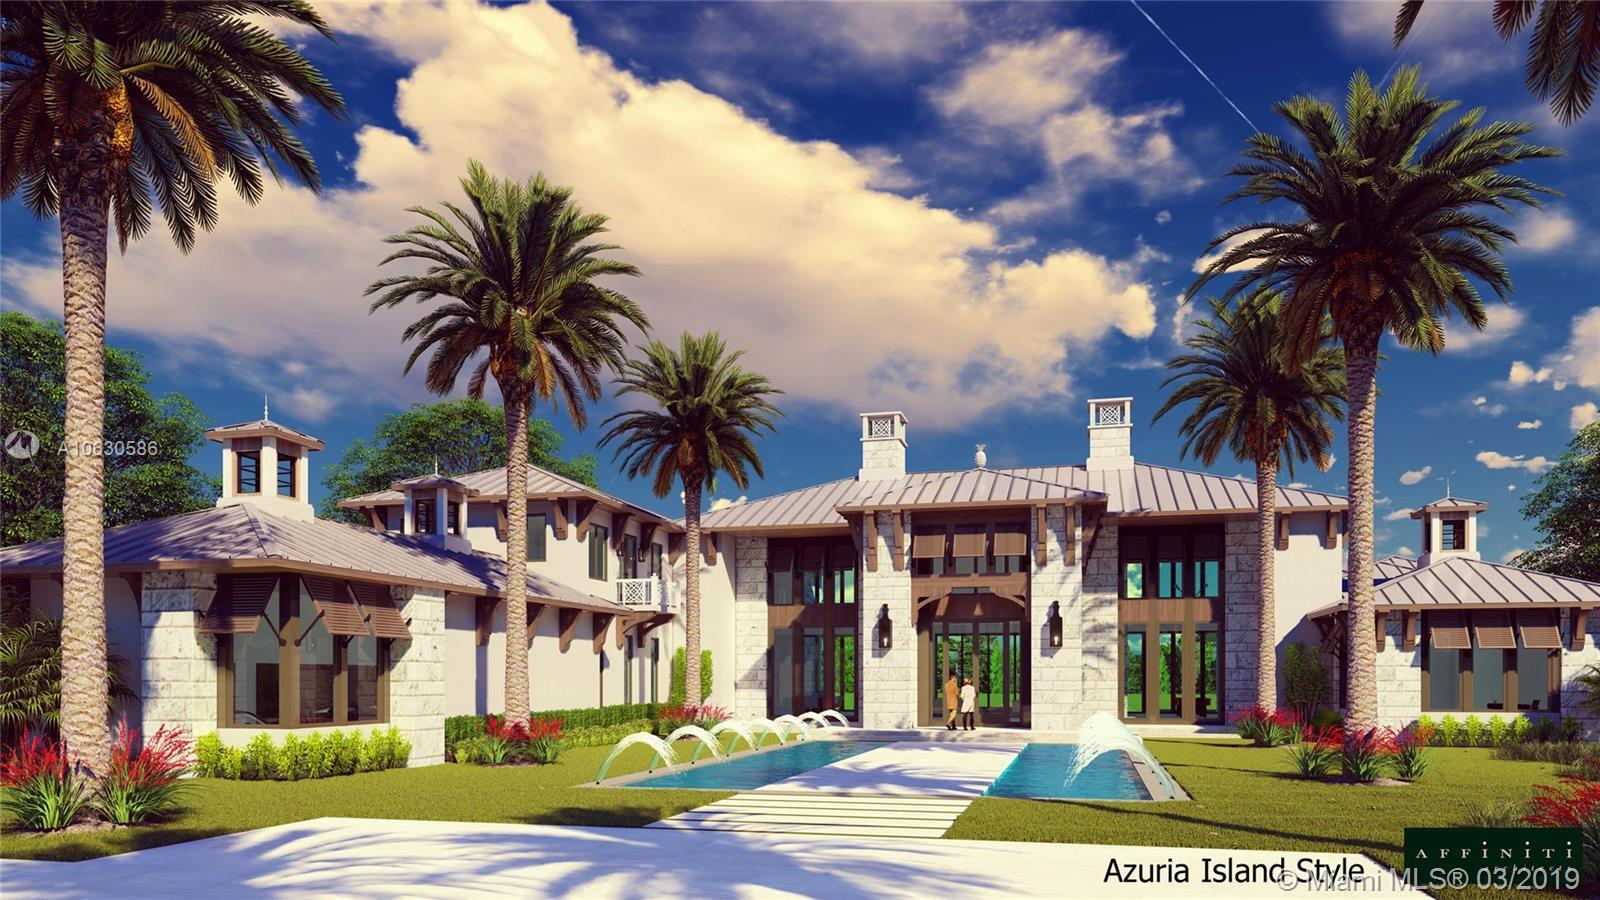 5450 Ascot Terrace - Southwest Ranches, Florida